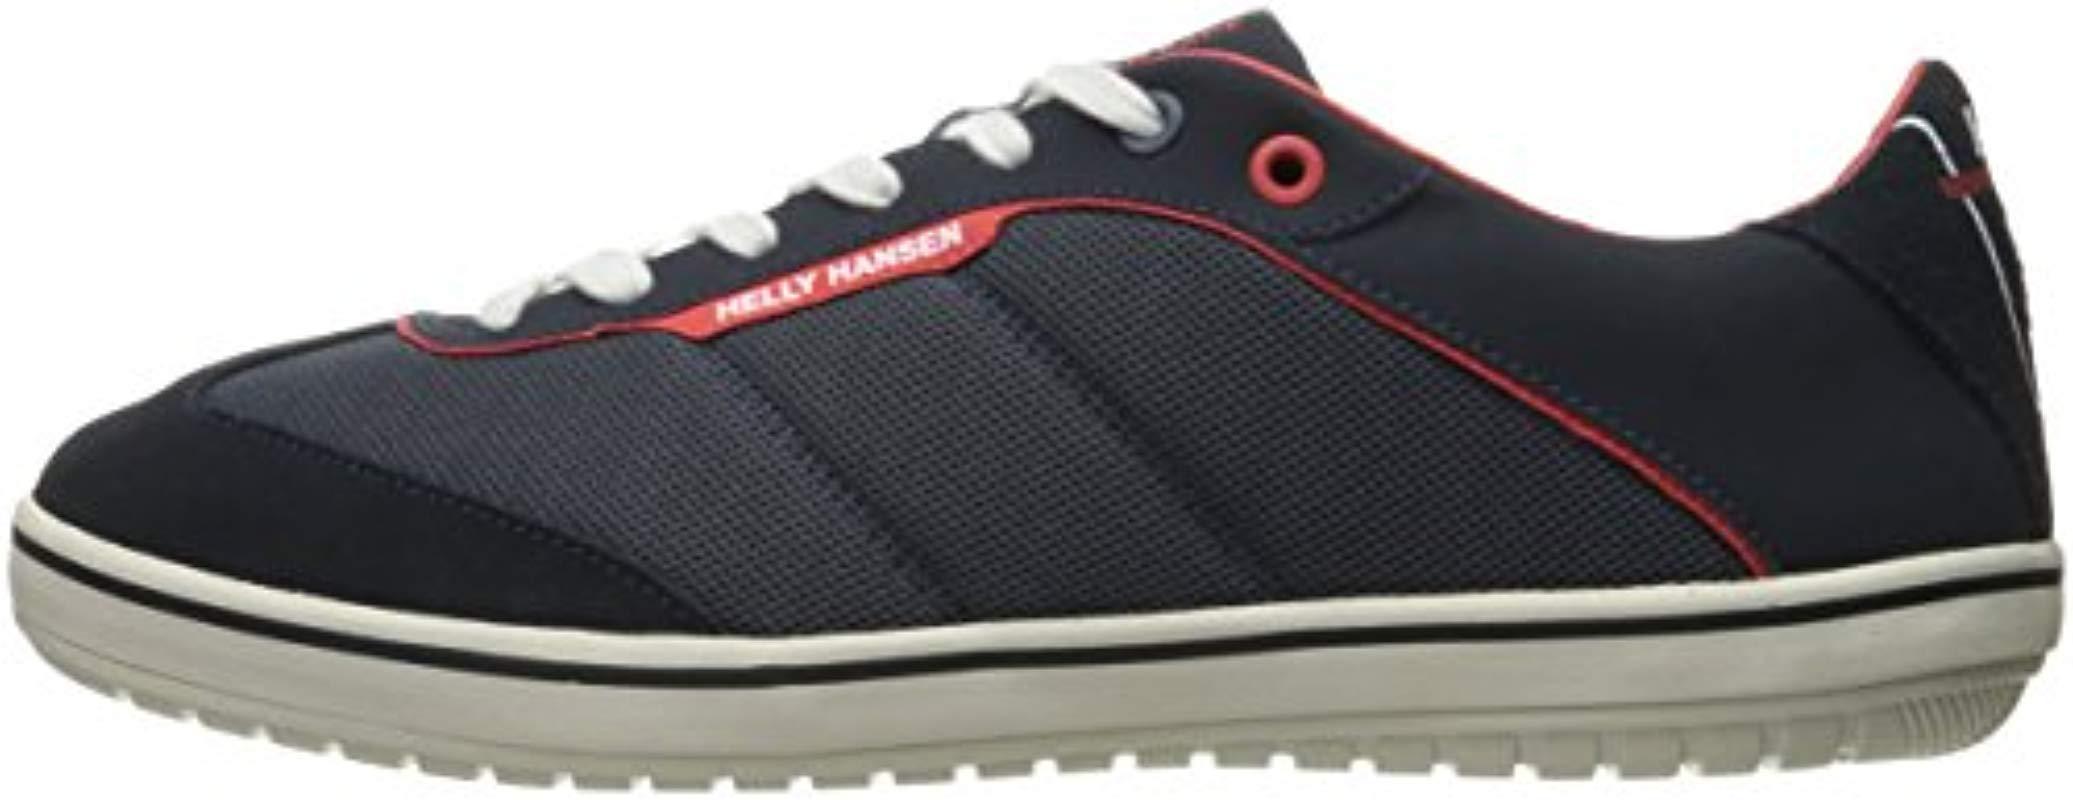 Helly Hansen Suede Ryvingen Fashion Sneaker in Blue for Men